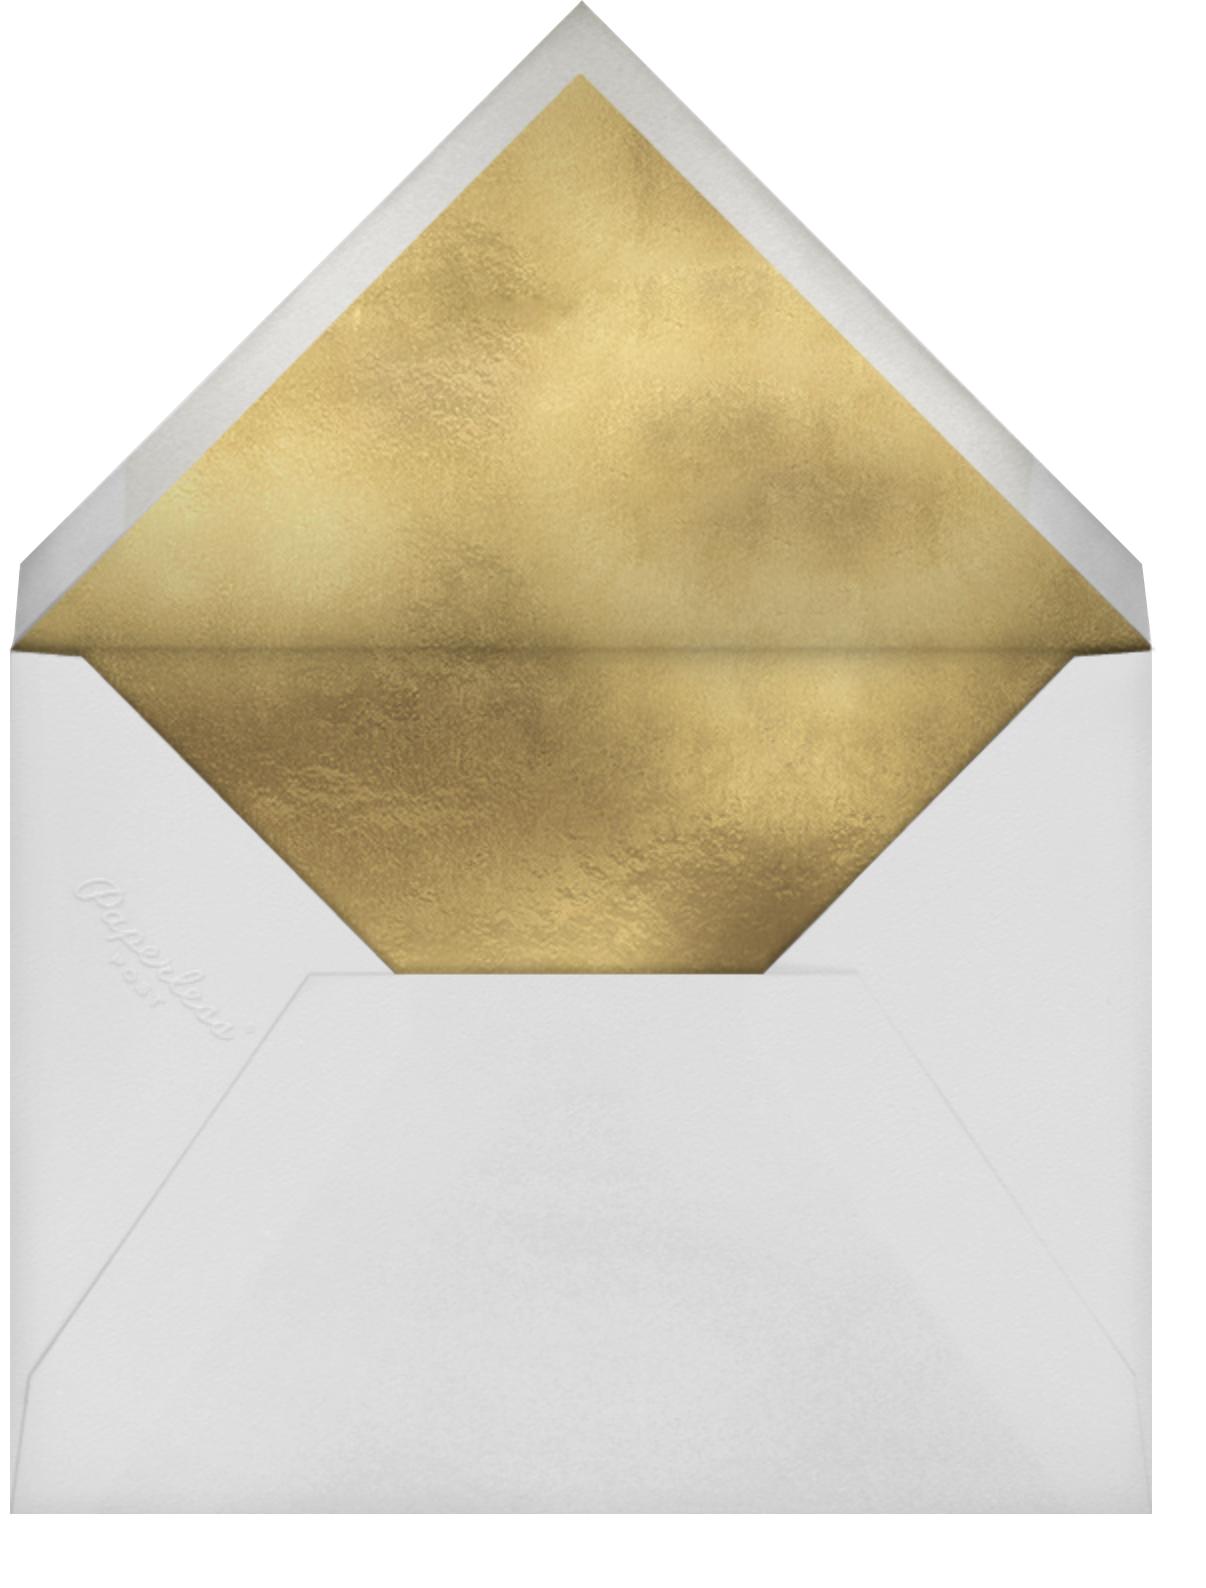 Leopard - Navy - kate spade new york - General entertaining - envelope back